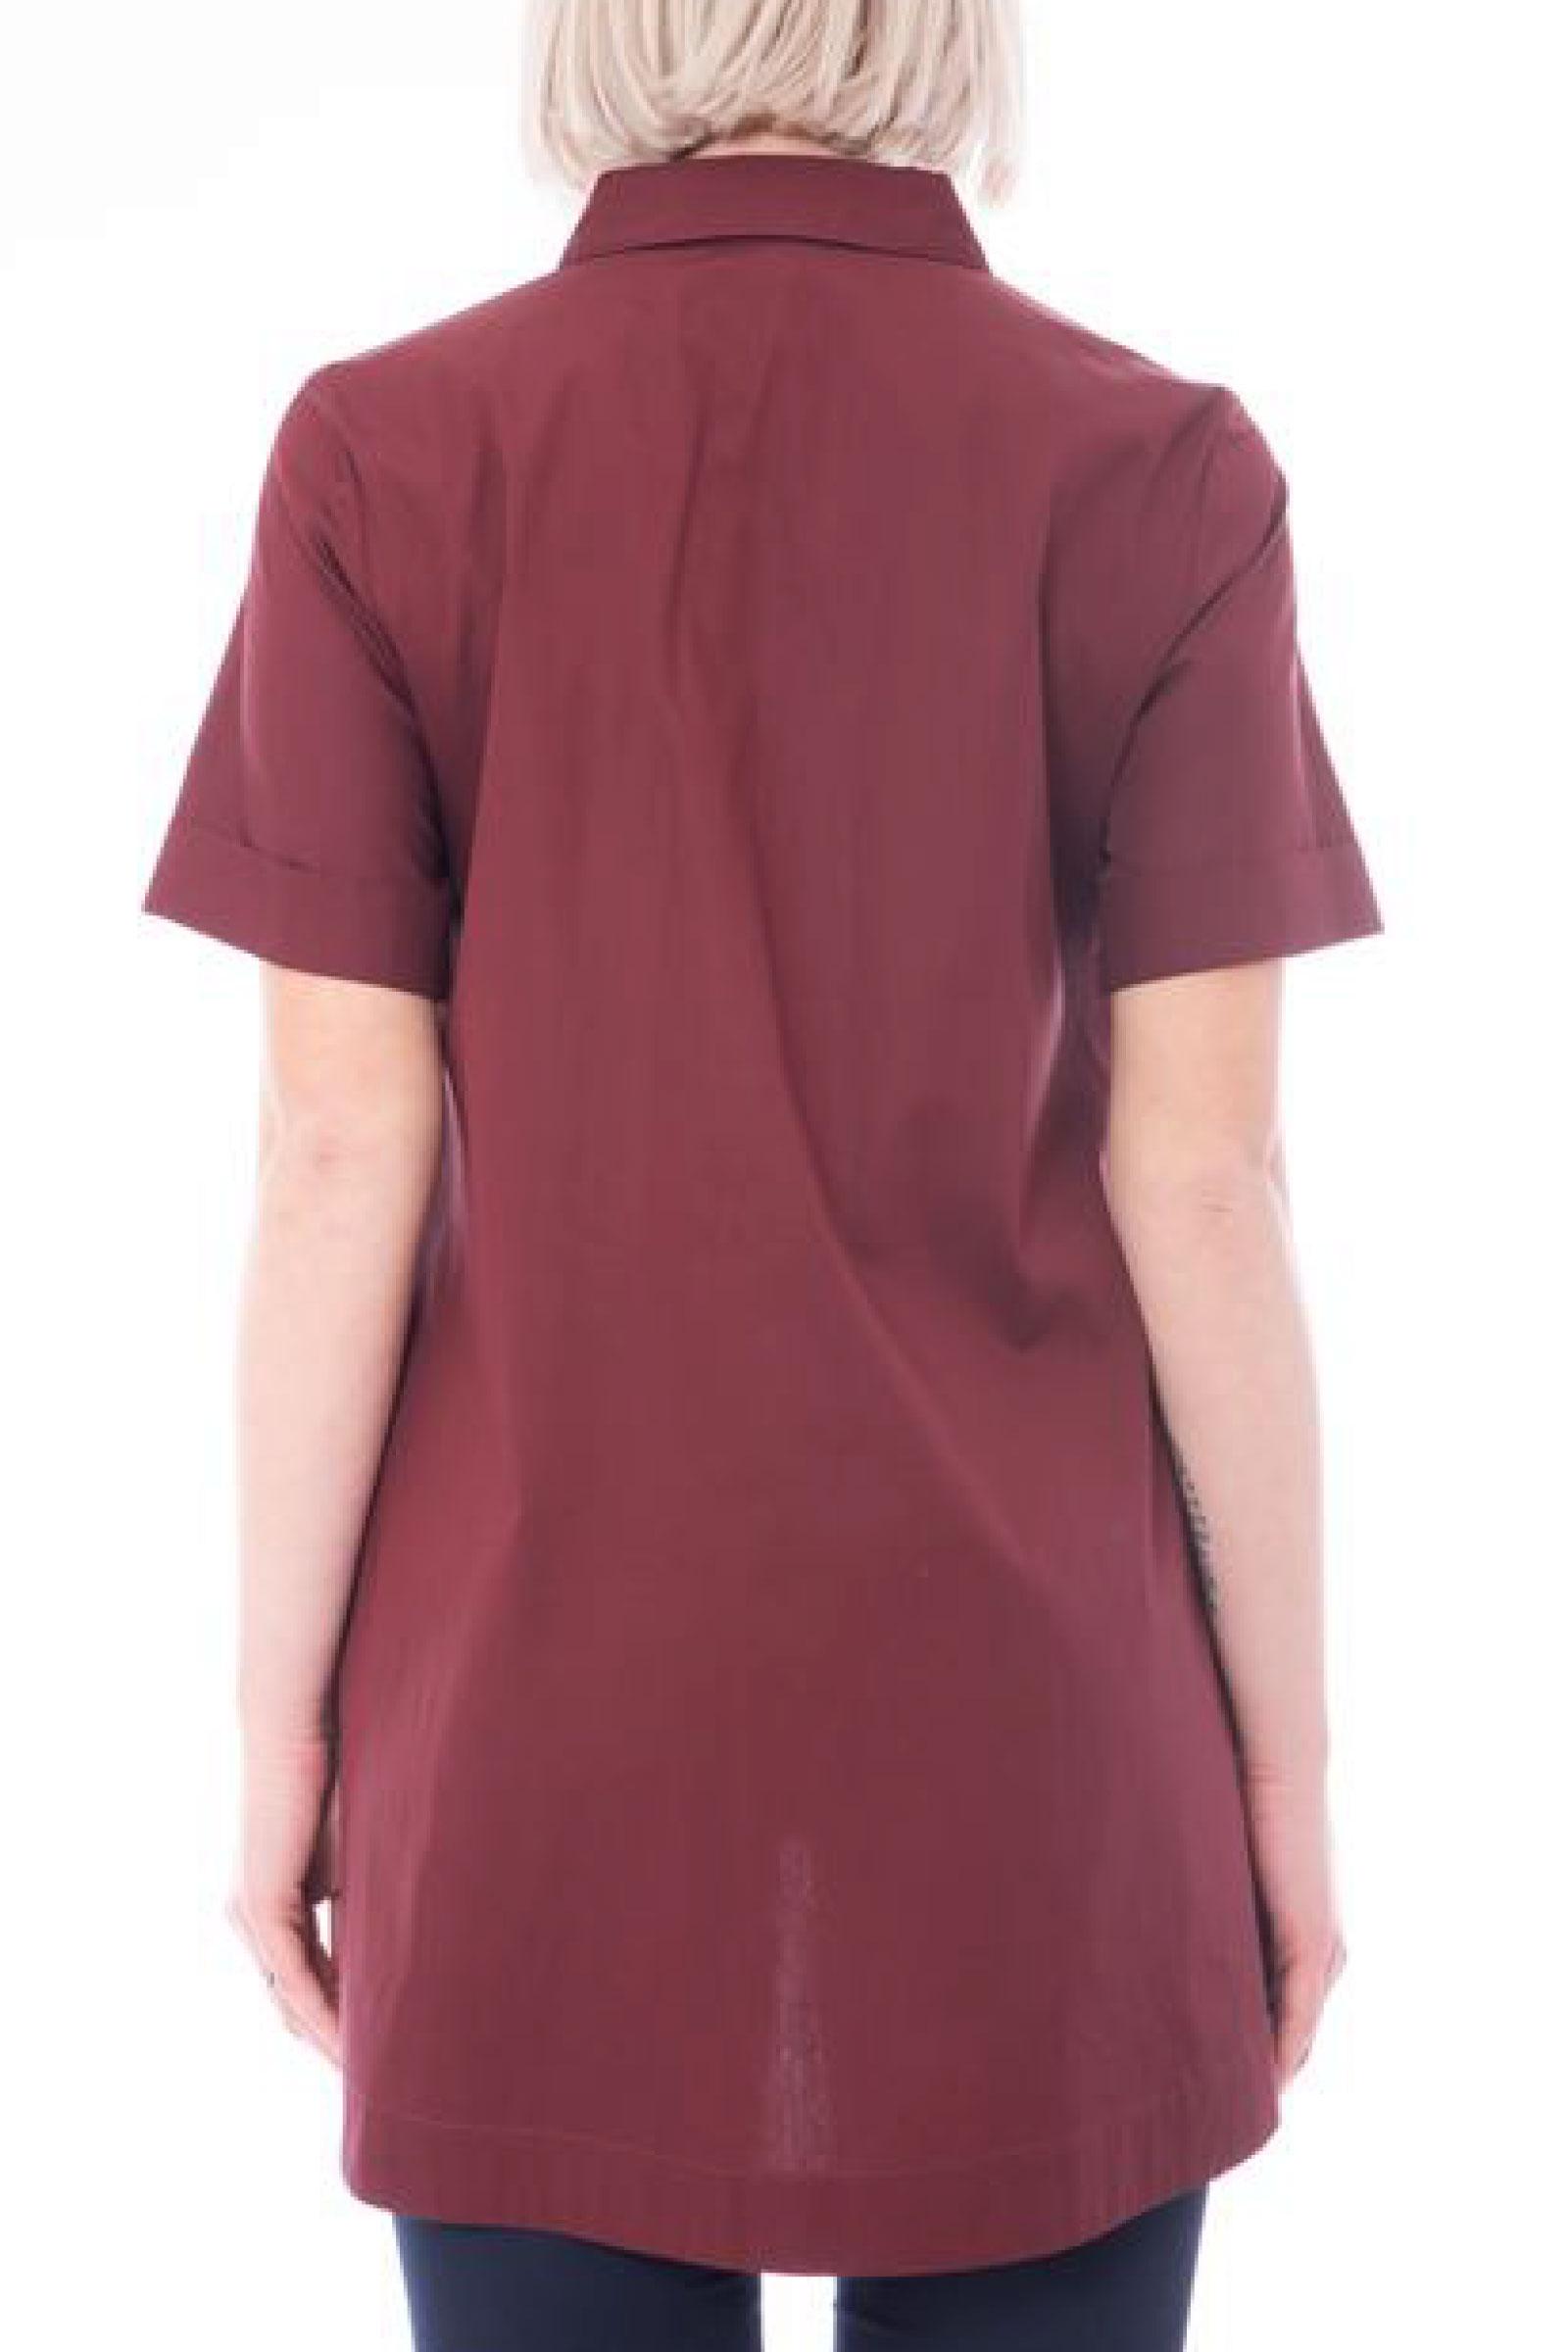 EMME MARELLA | Shirt | 51910414000004